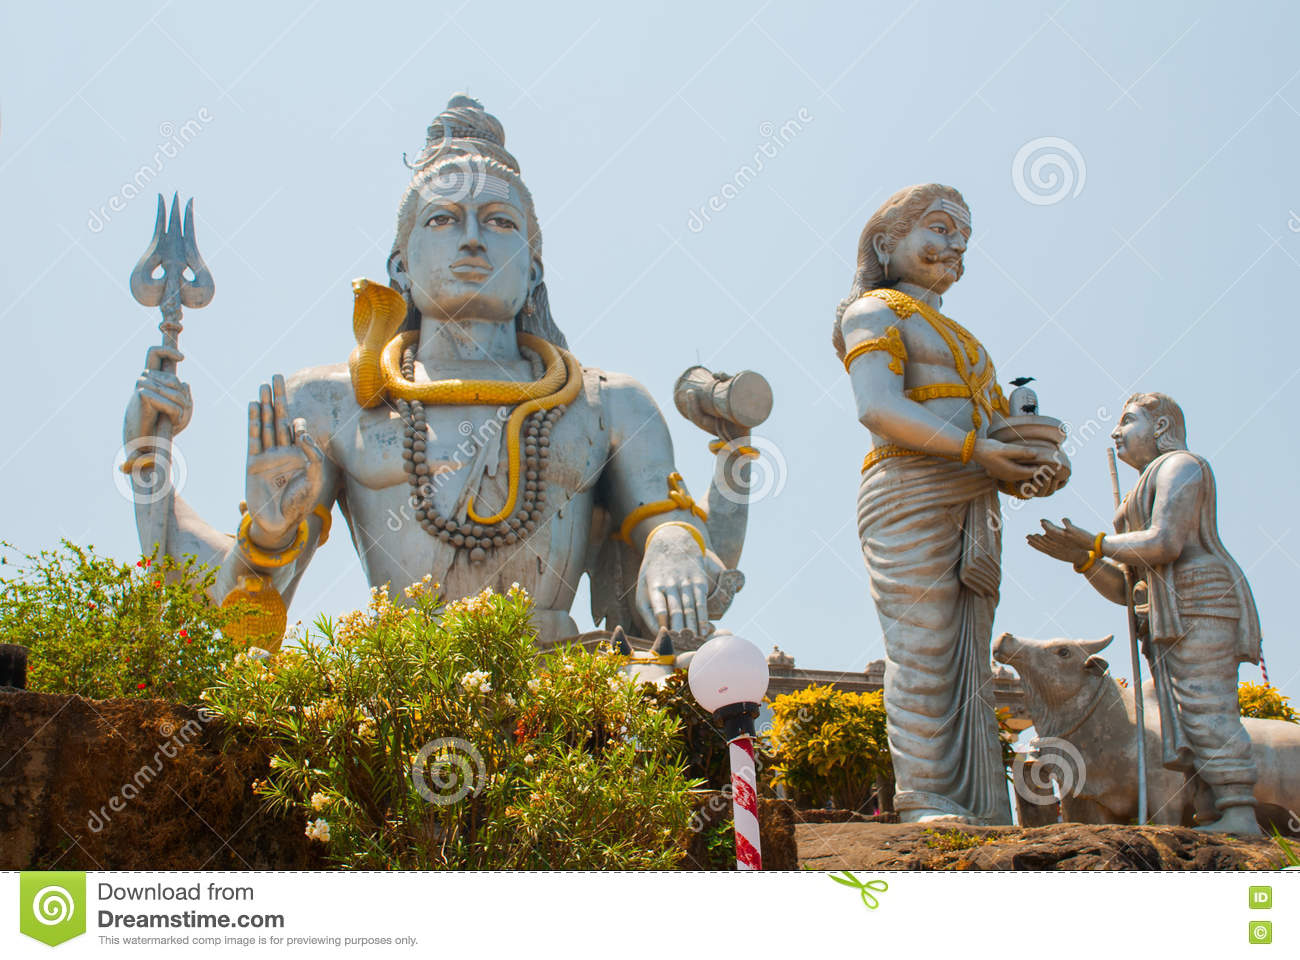 Statue Of Lord Shiva In Murudeshwar. Temple In Karnataka, India.